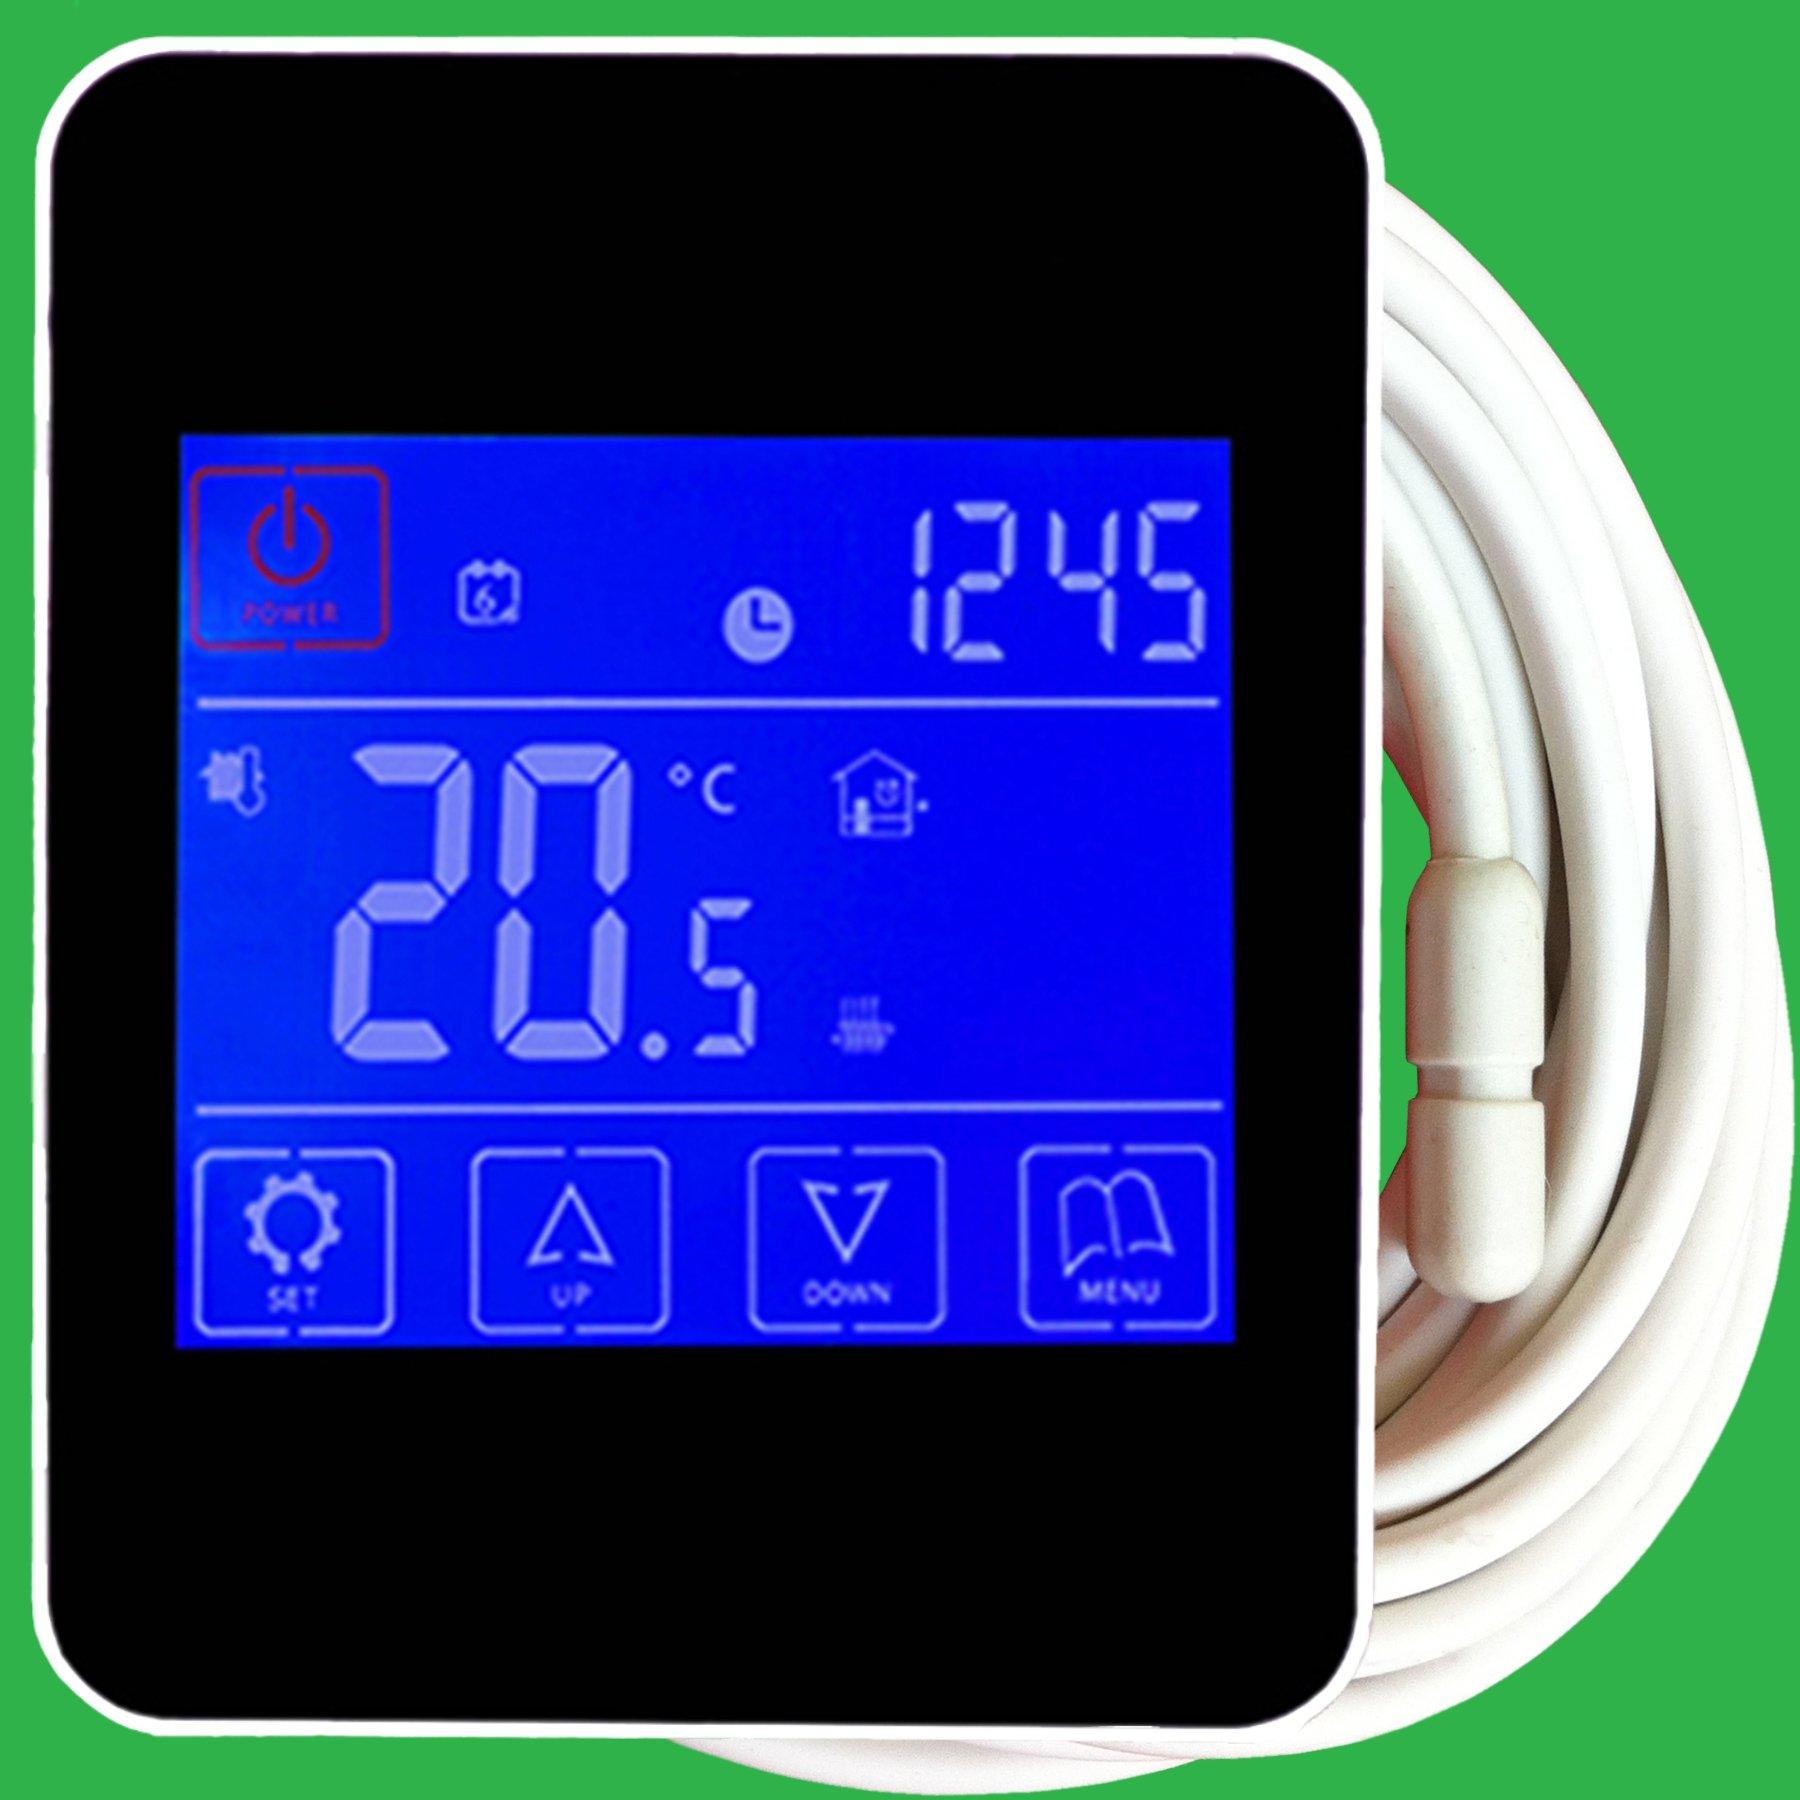 Reliance Black Touchscreen Underfloor Heating Thermostat